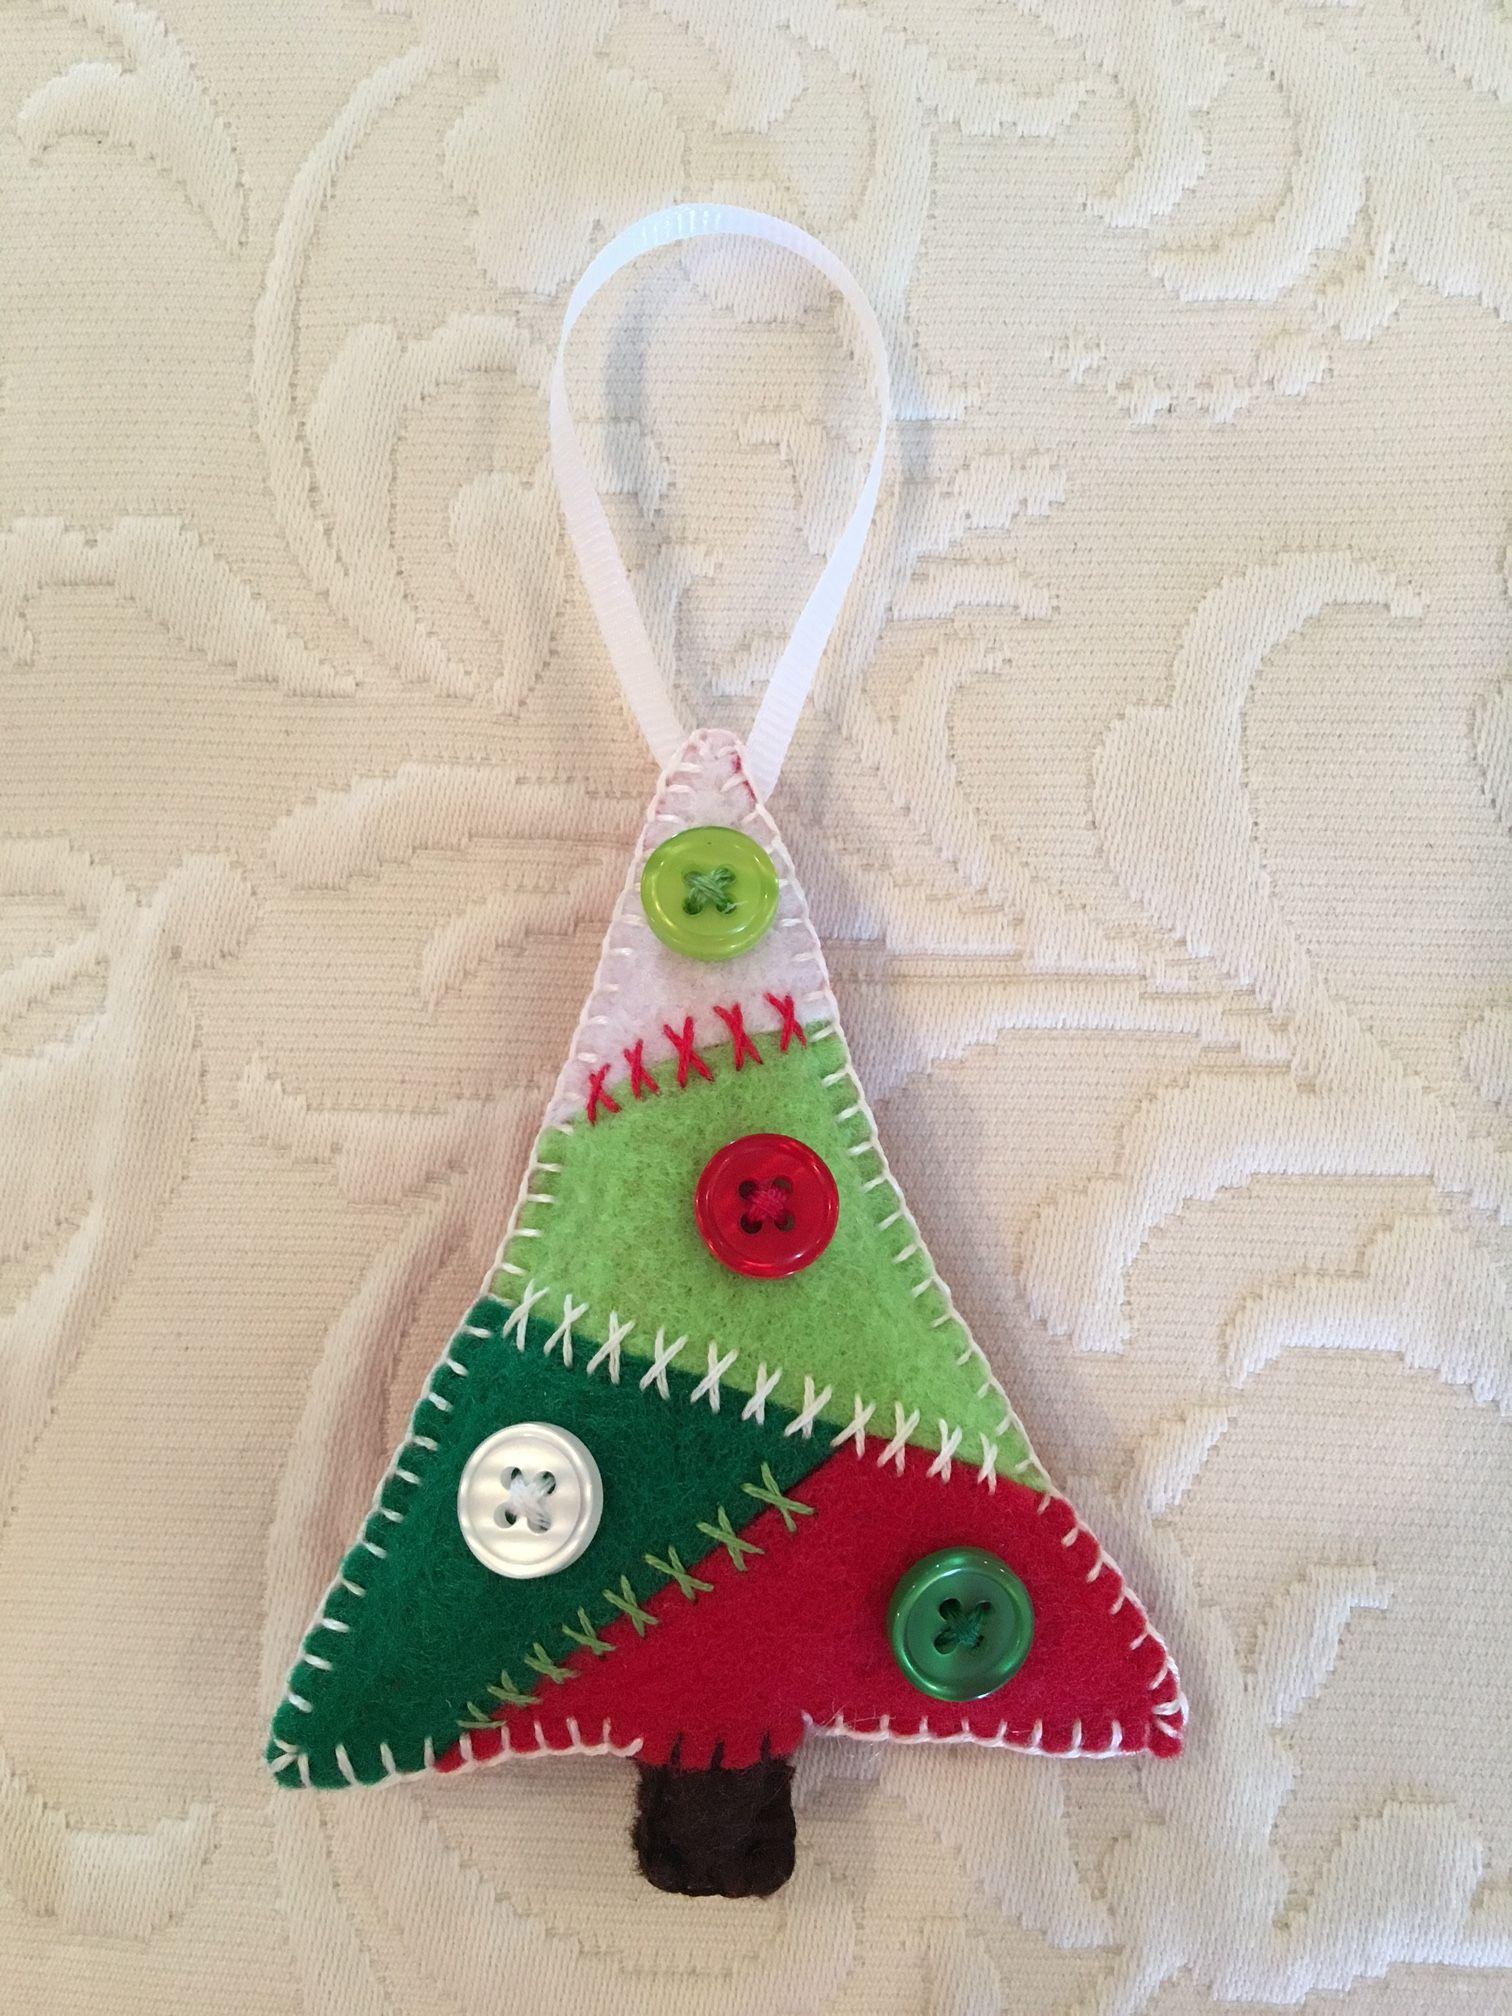 Felt Crafts Felt Ornament Christmas Tree Patchwork Tree